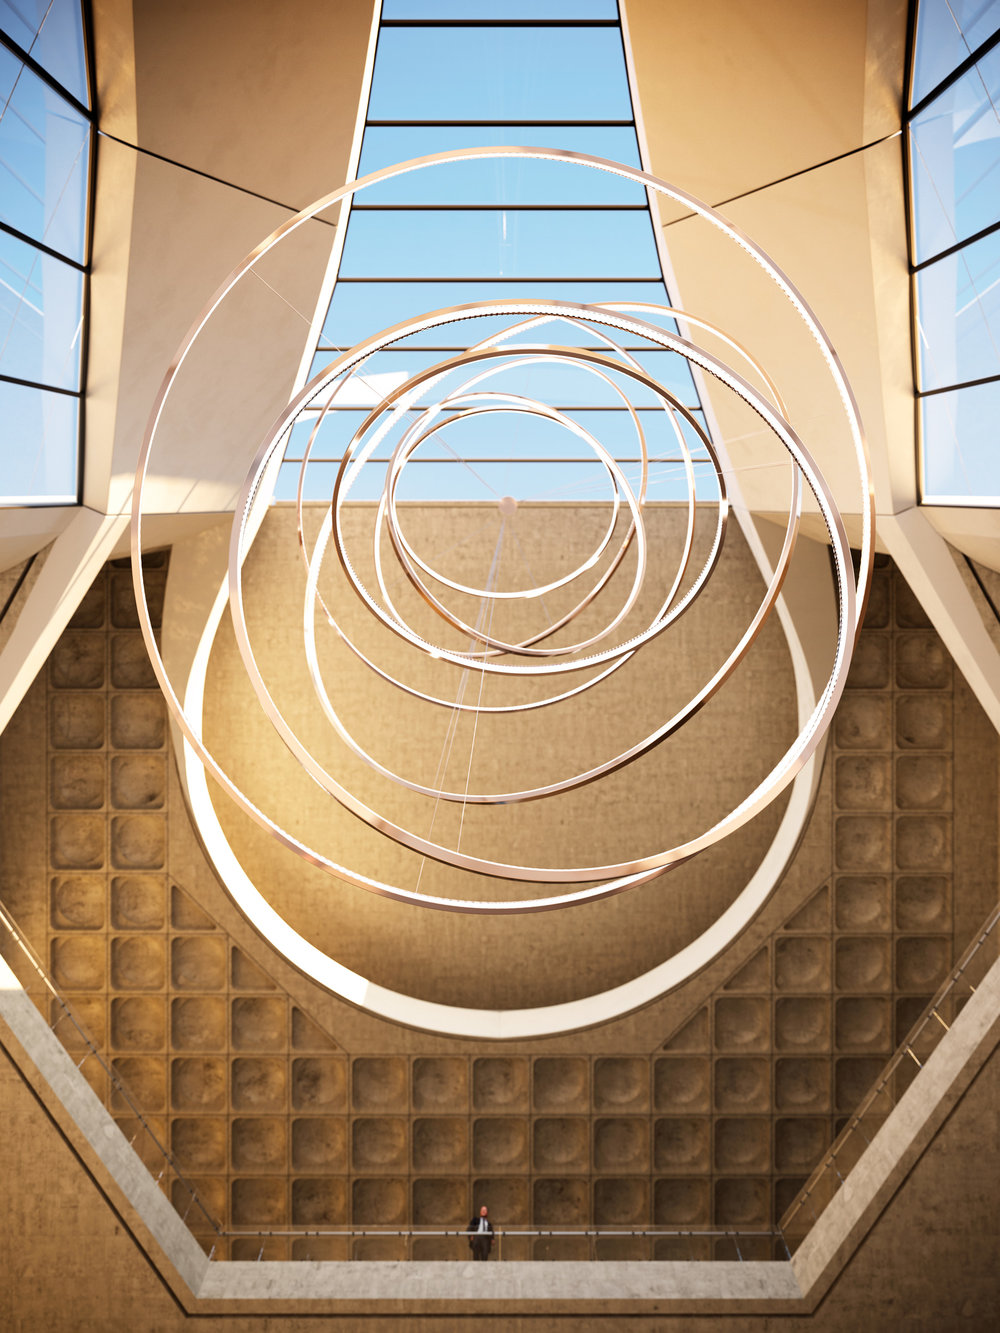 Recent_Spaces_Cameron_Design_House_Large_Lohja_02.jpg